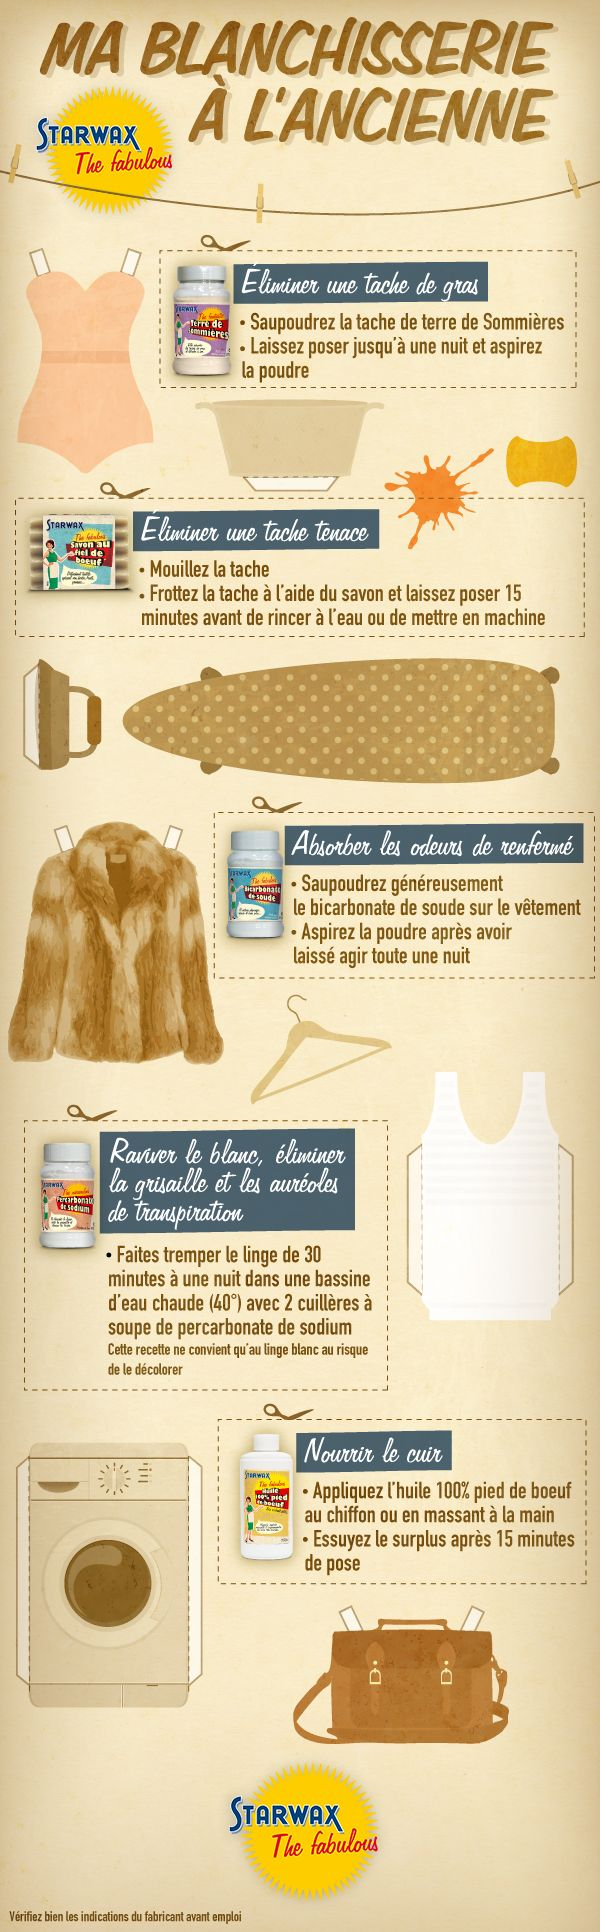 ♥ Pinterest : Mutine Lolita ♥ Blanchisserie à l'ancienne #astucieux